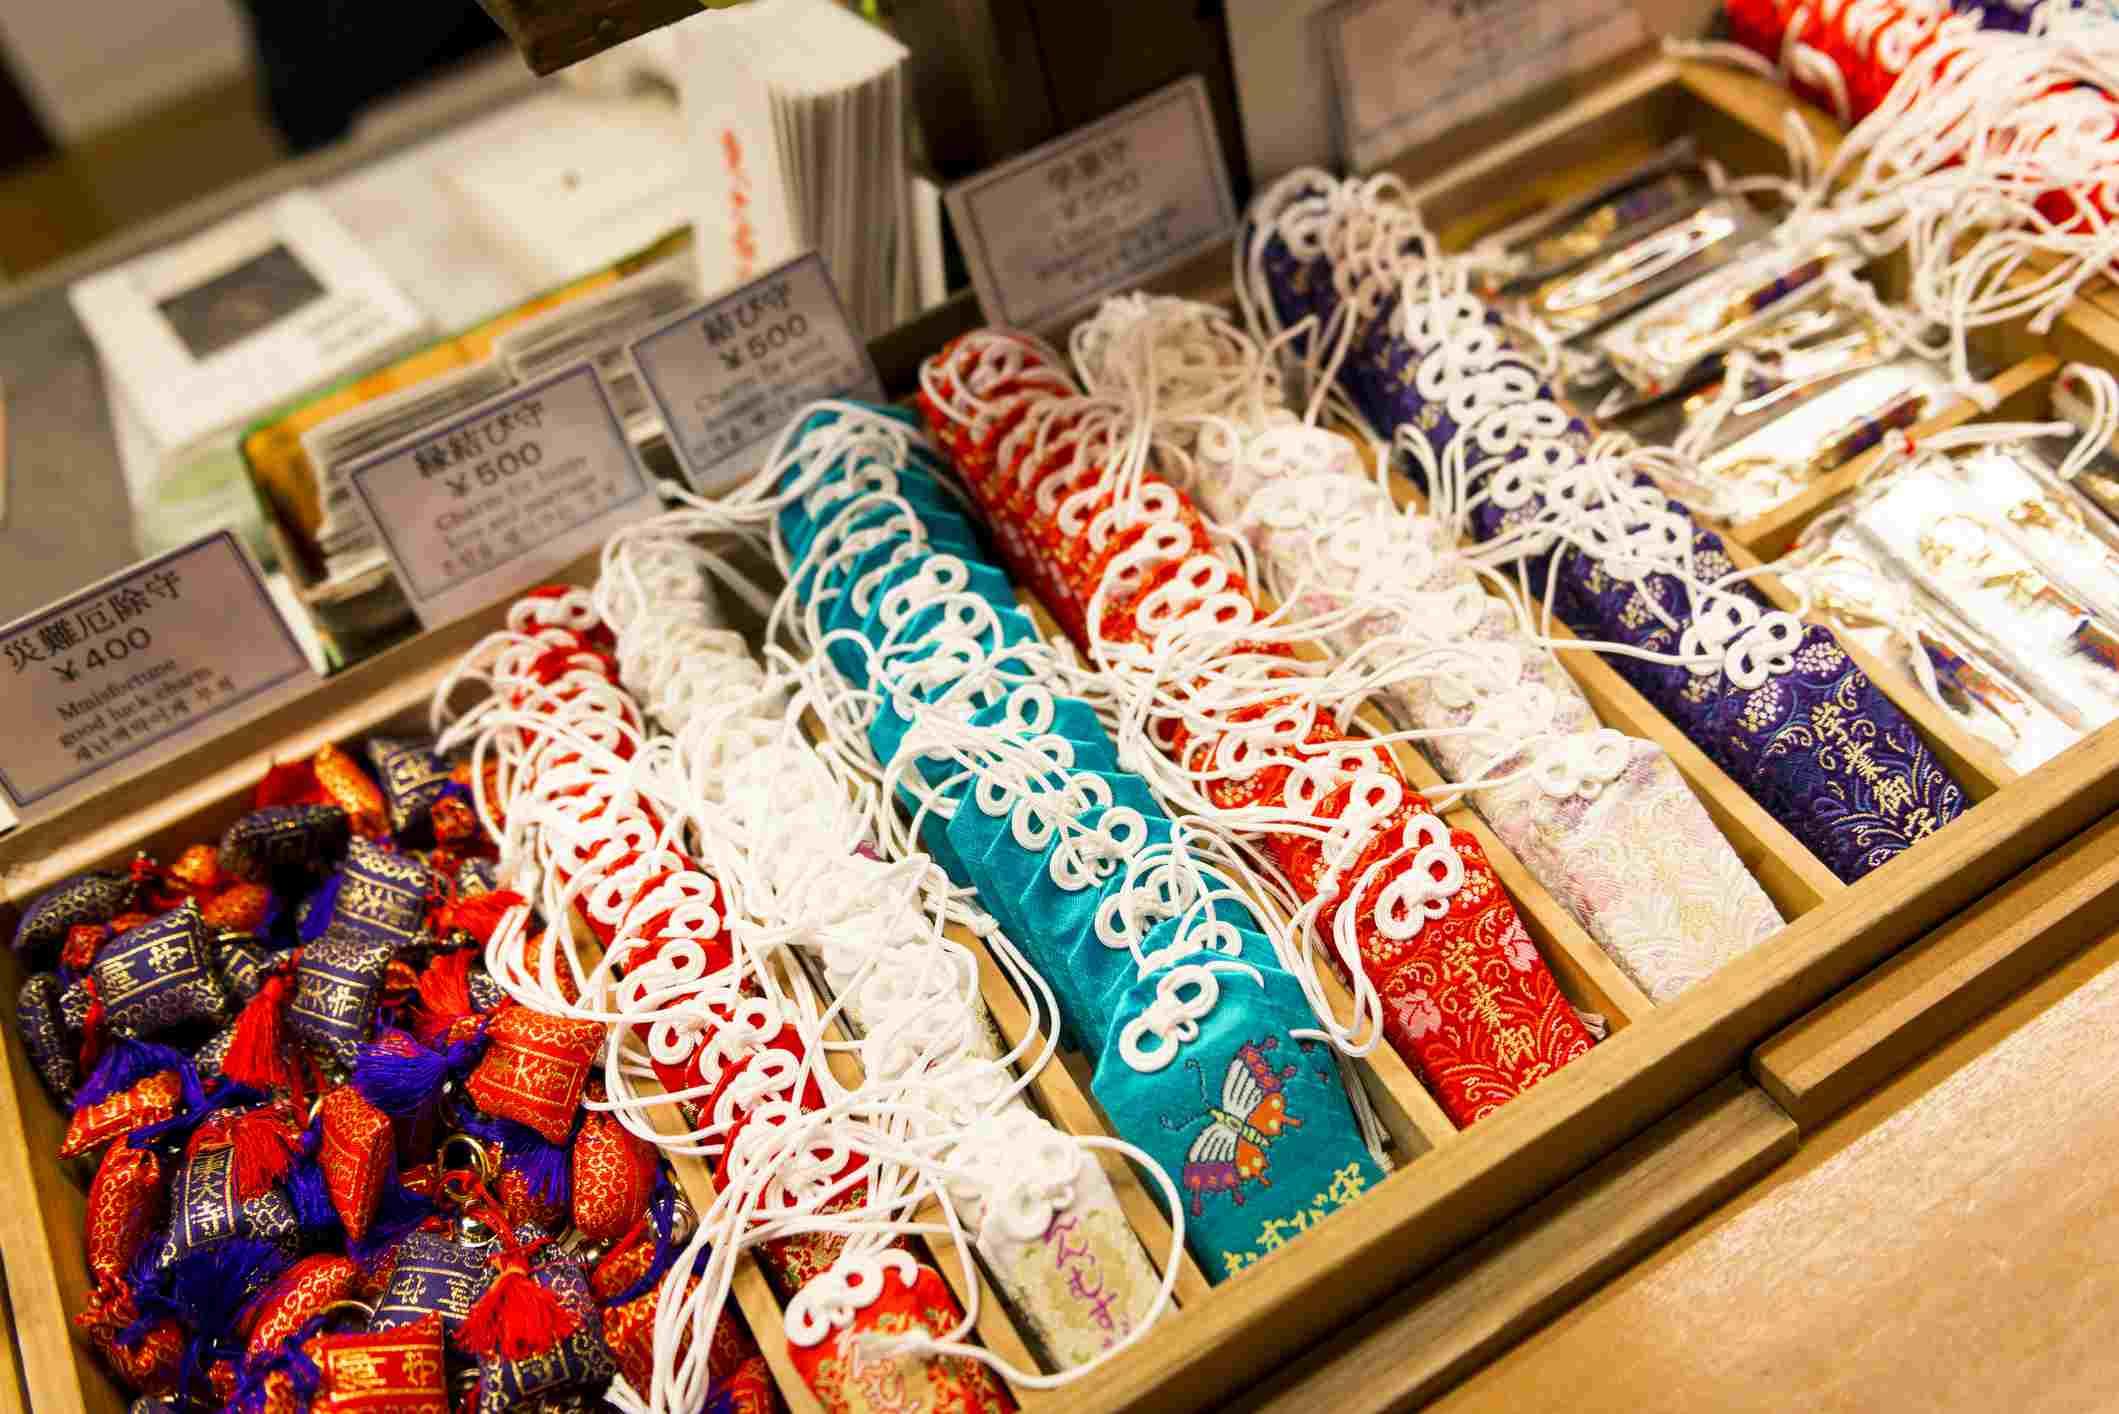 Variety of colourful Omamori or Japanese amulet